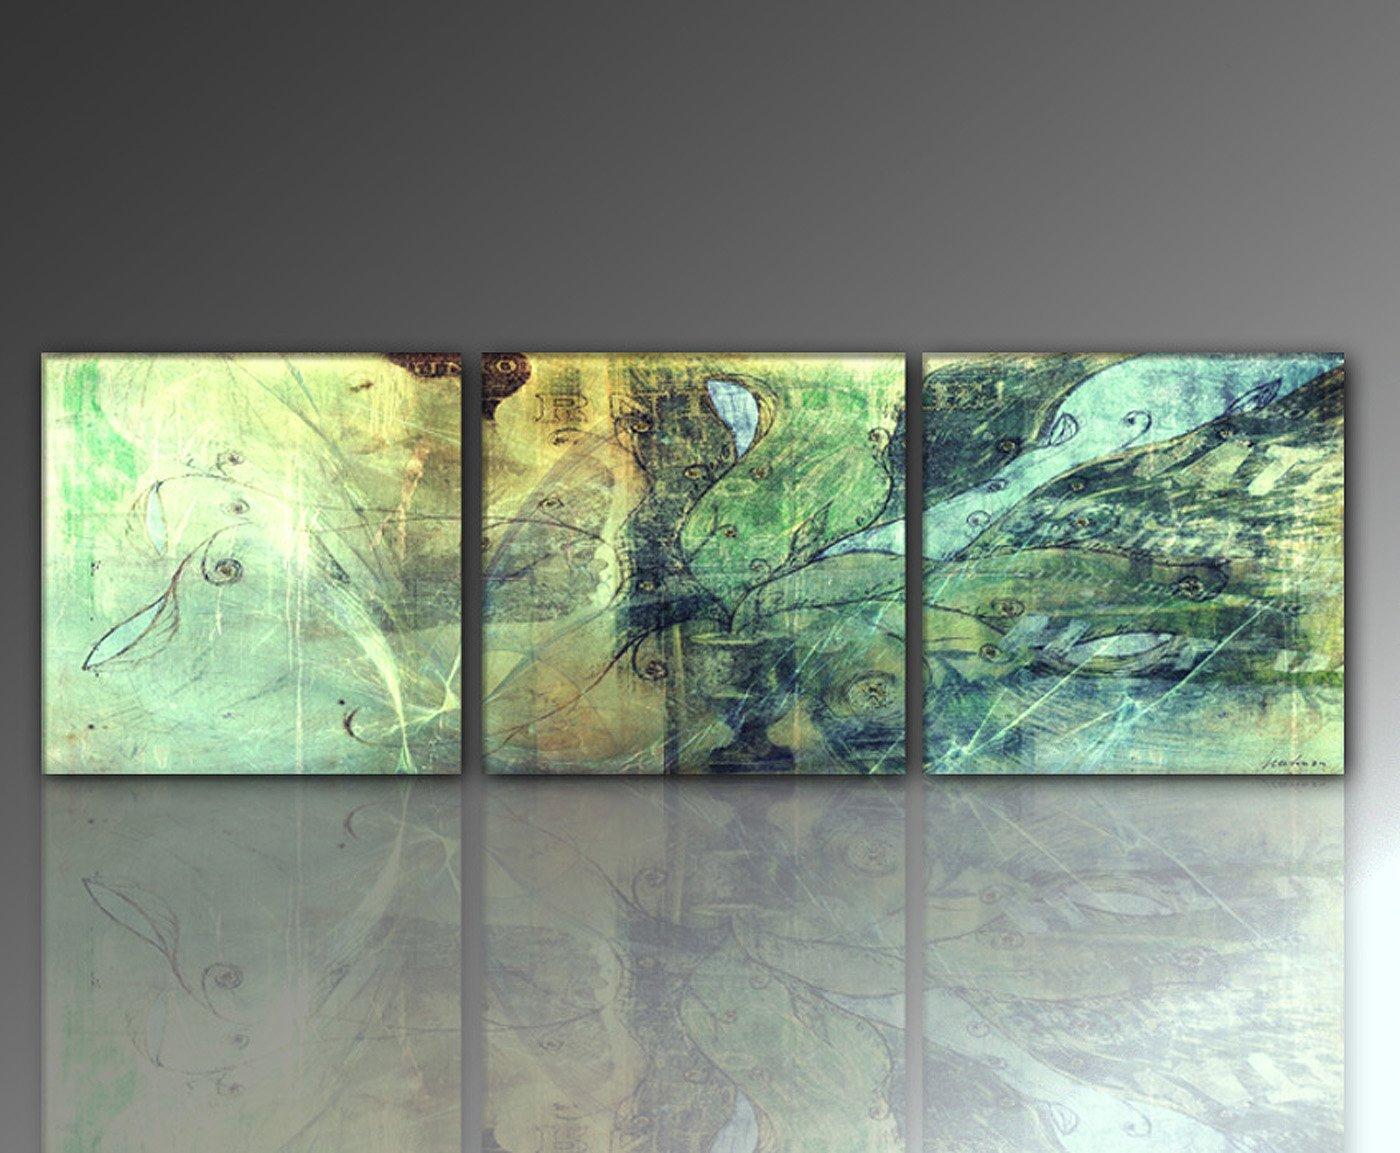 TOP PREIS Wandbild 3 BILDER insgesamt 150x50 cm (unio-3teilig ...